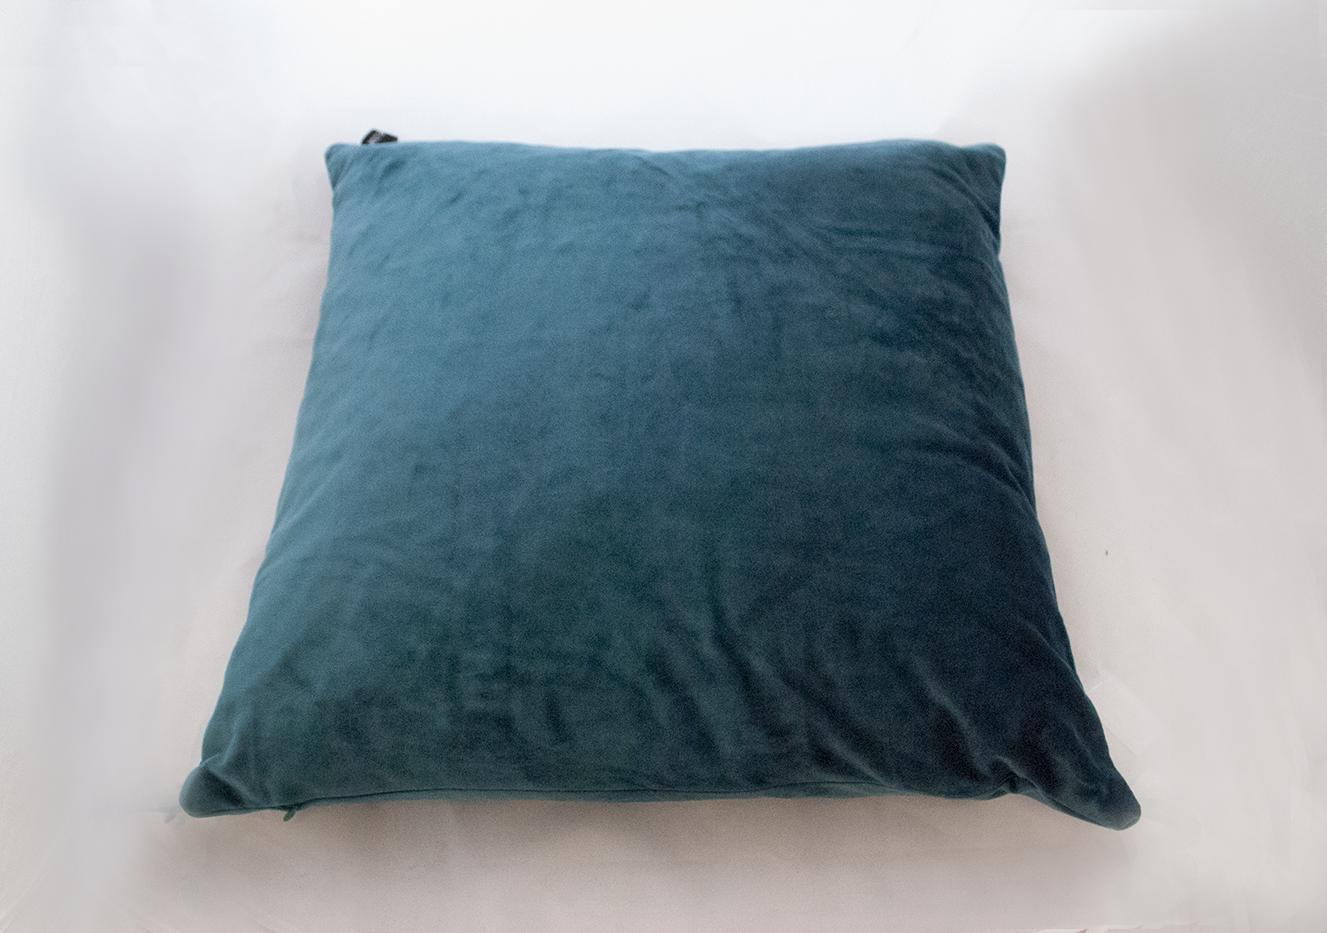 teal velvet pillow   Quantity: 1  Price: $10.00